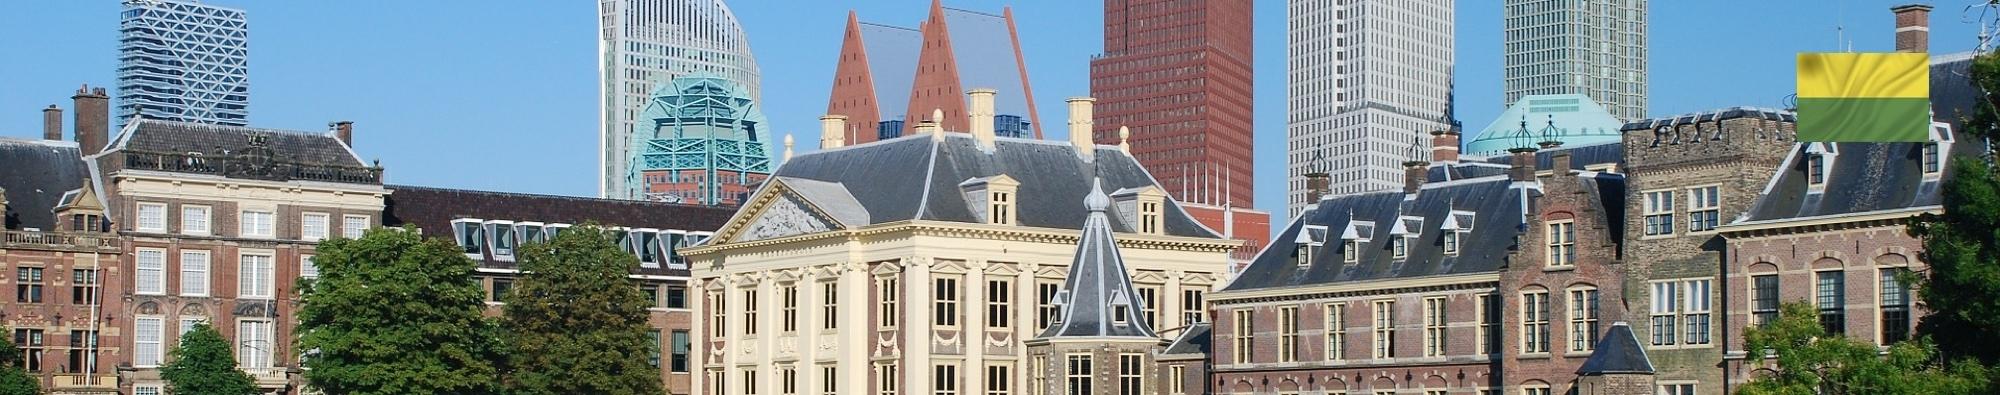 knuz inloggen Den Haag